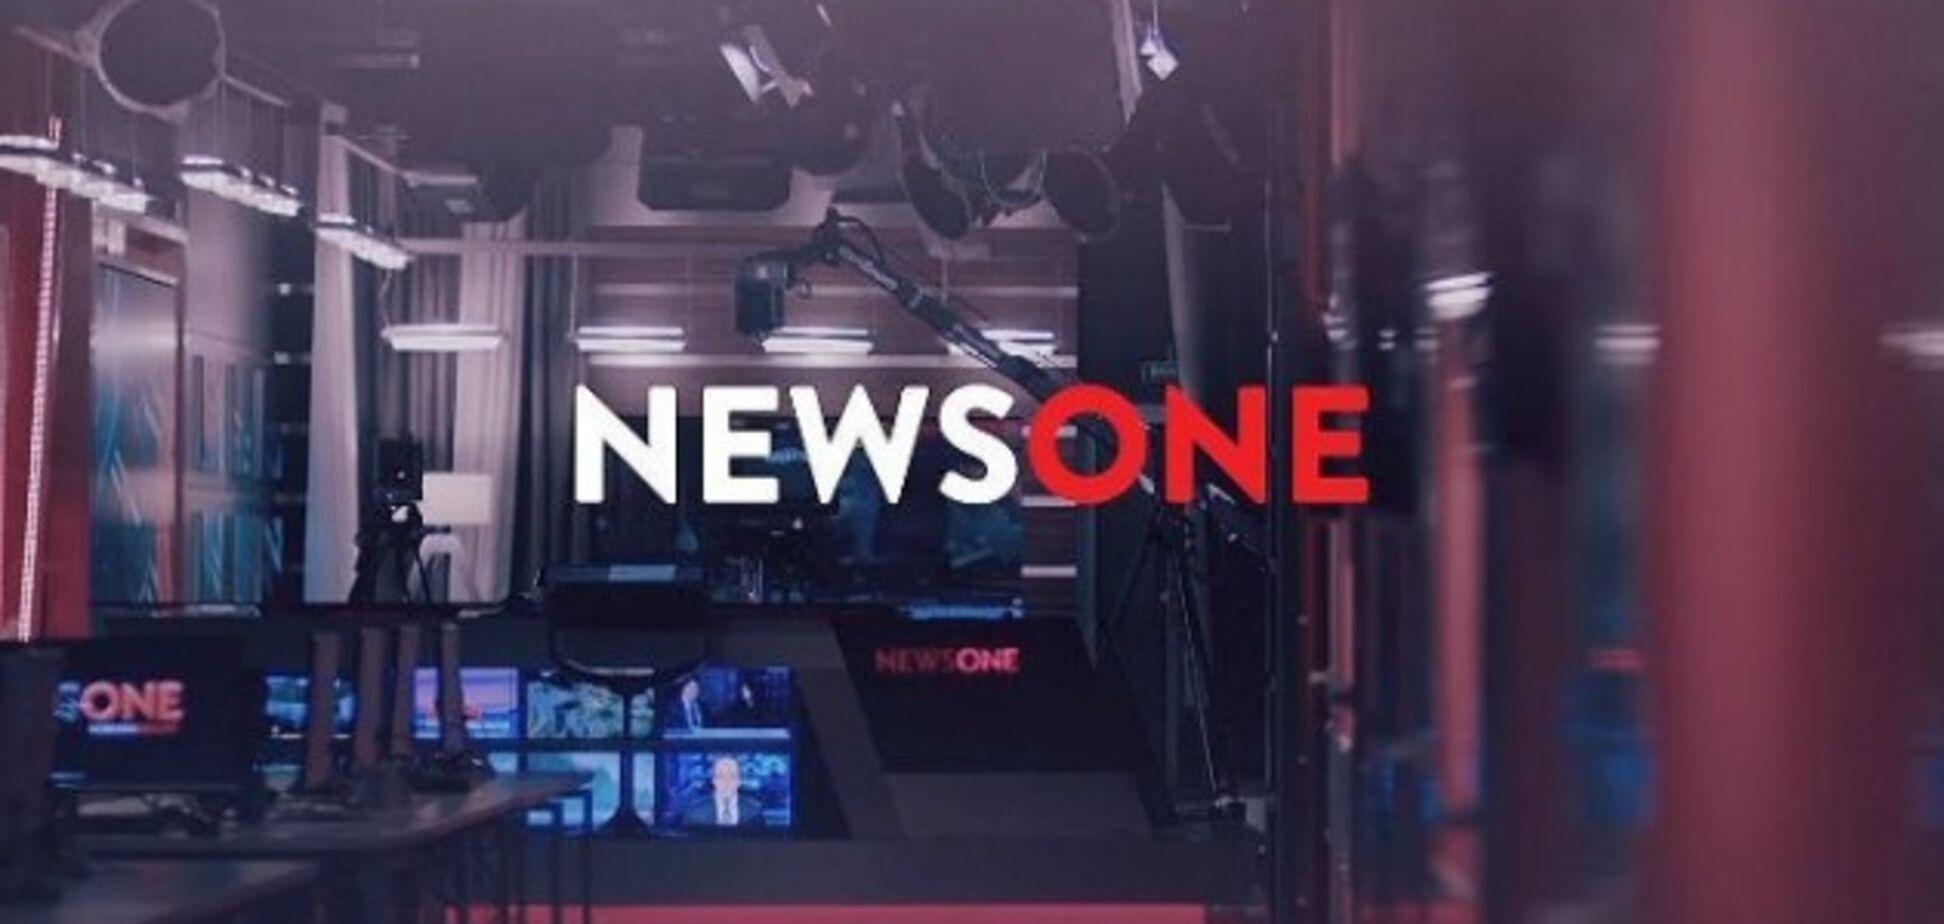 NewsOne внезапно отменил телемост с Россией